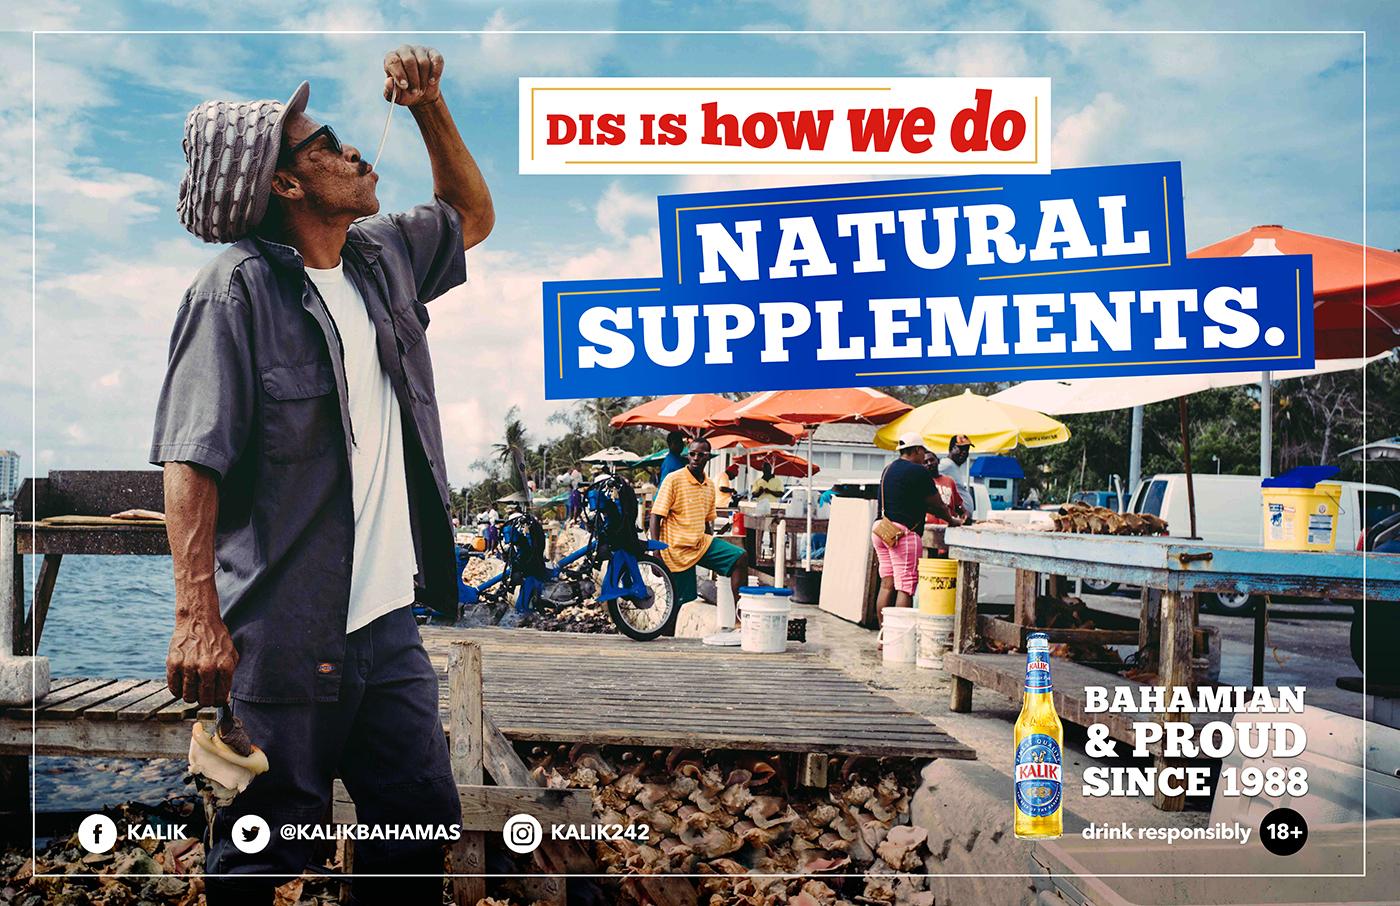 Kalik work - Dis Is How We Do Natural Supplements_final2.jpg